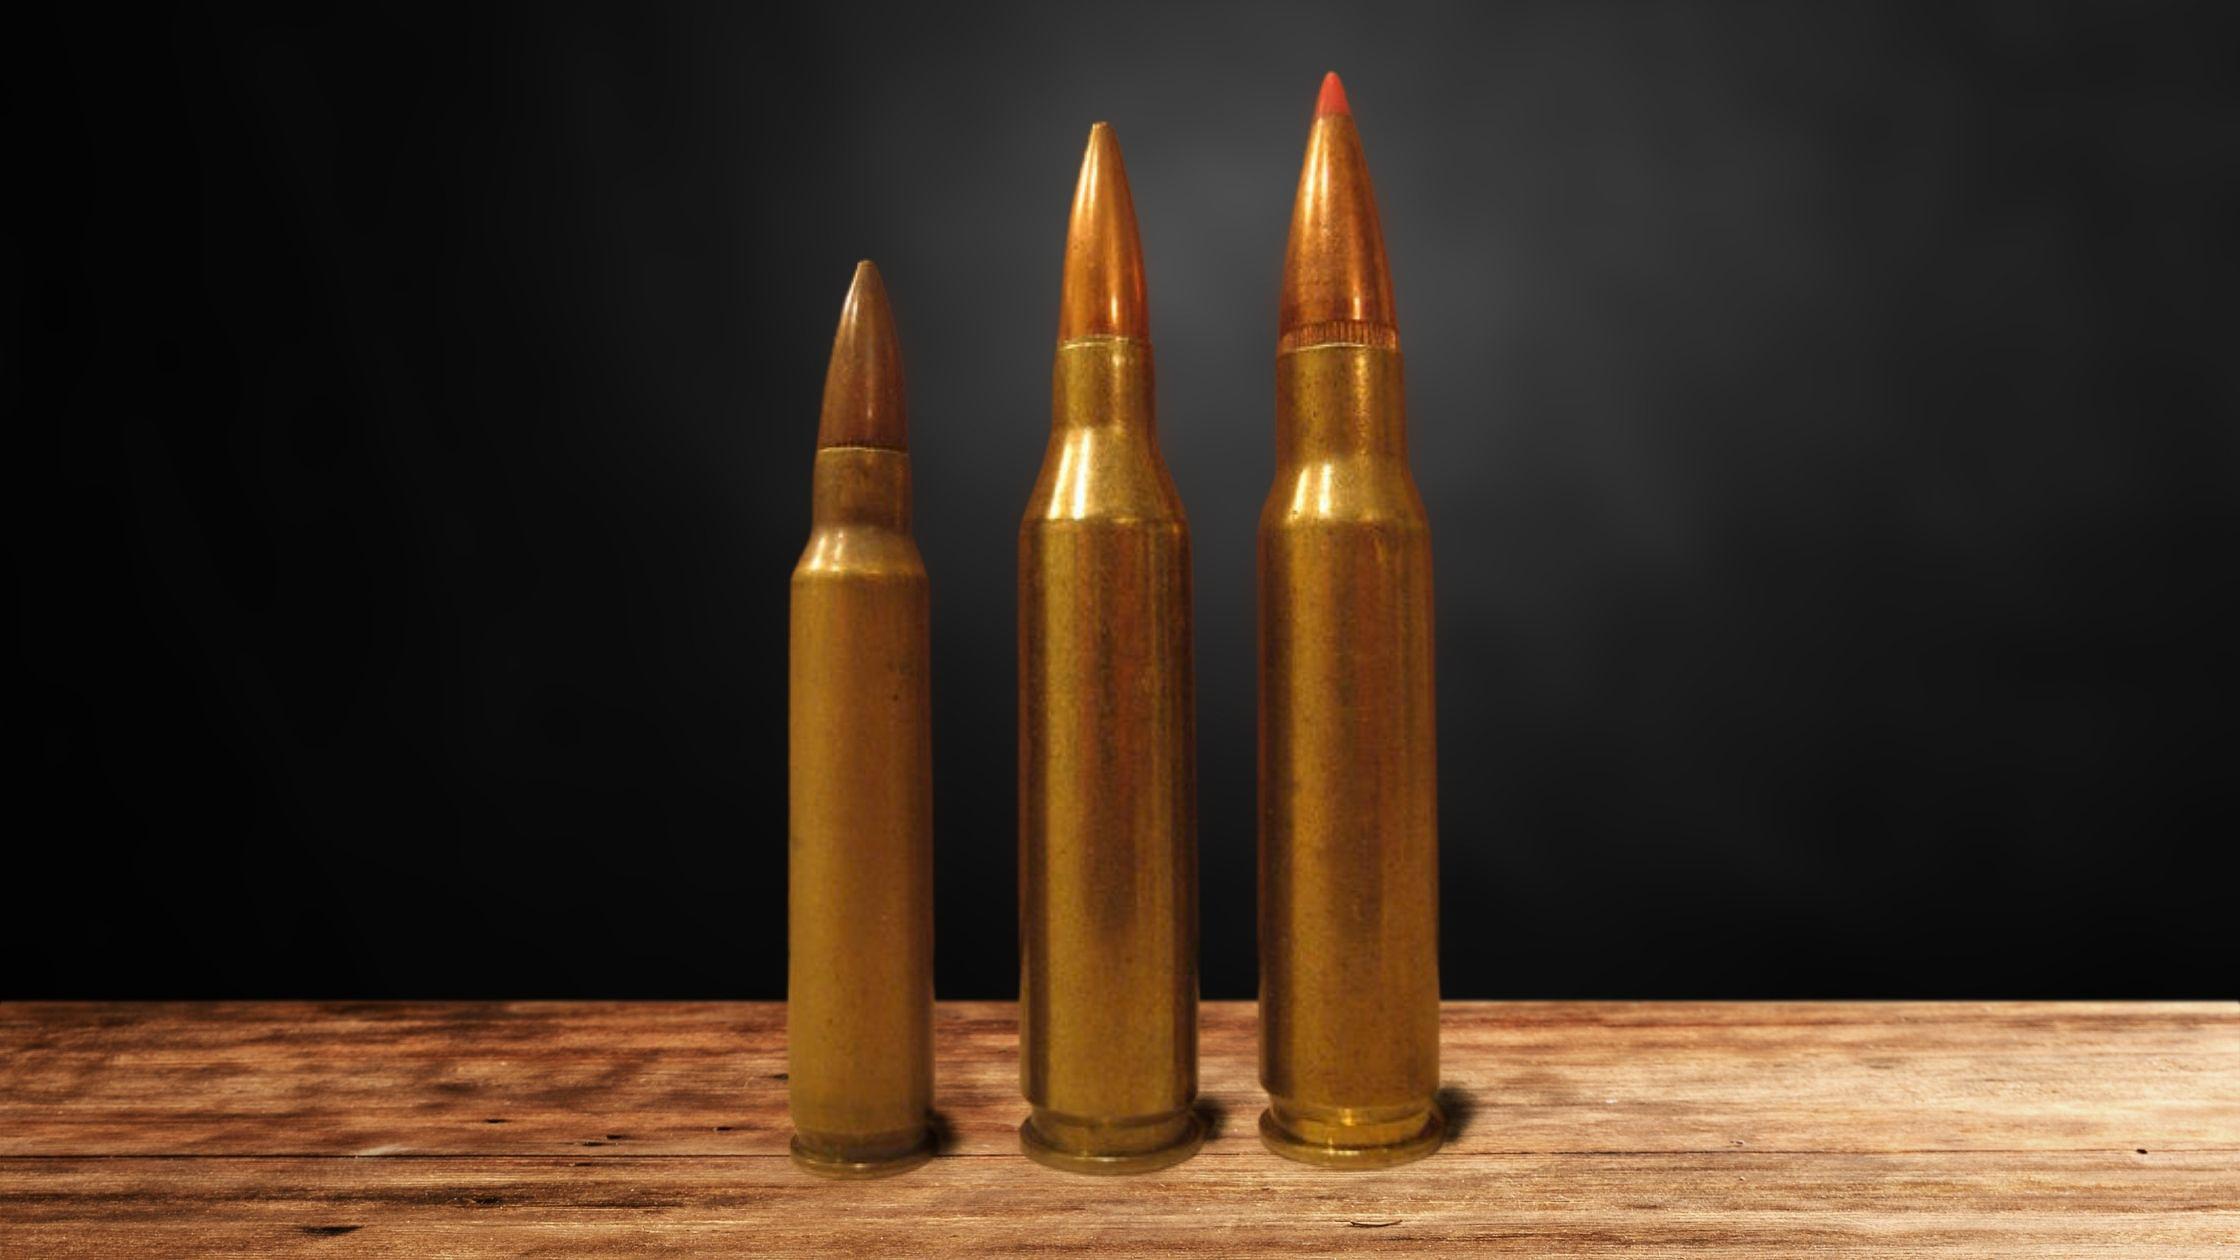 Best 243 Bullet for Deer